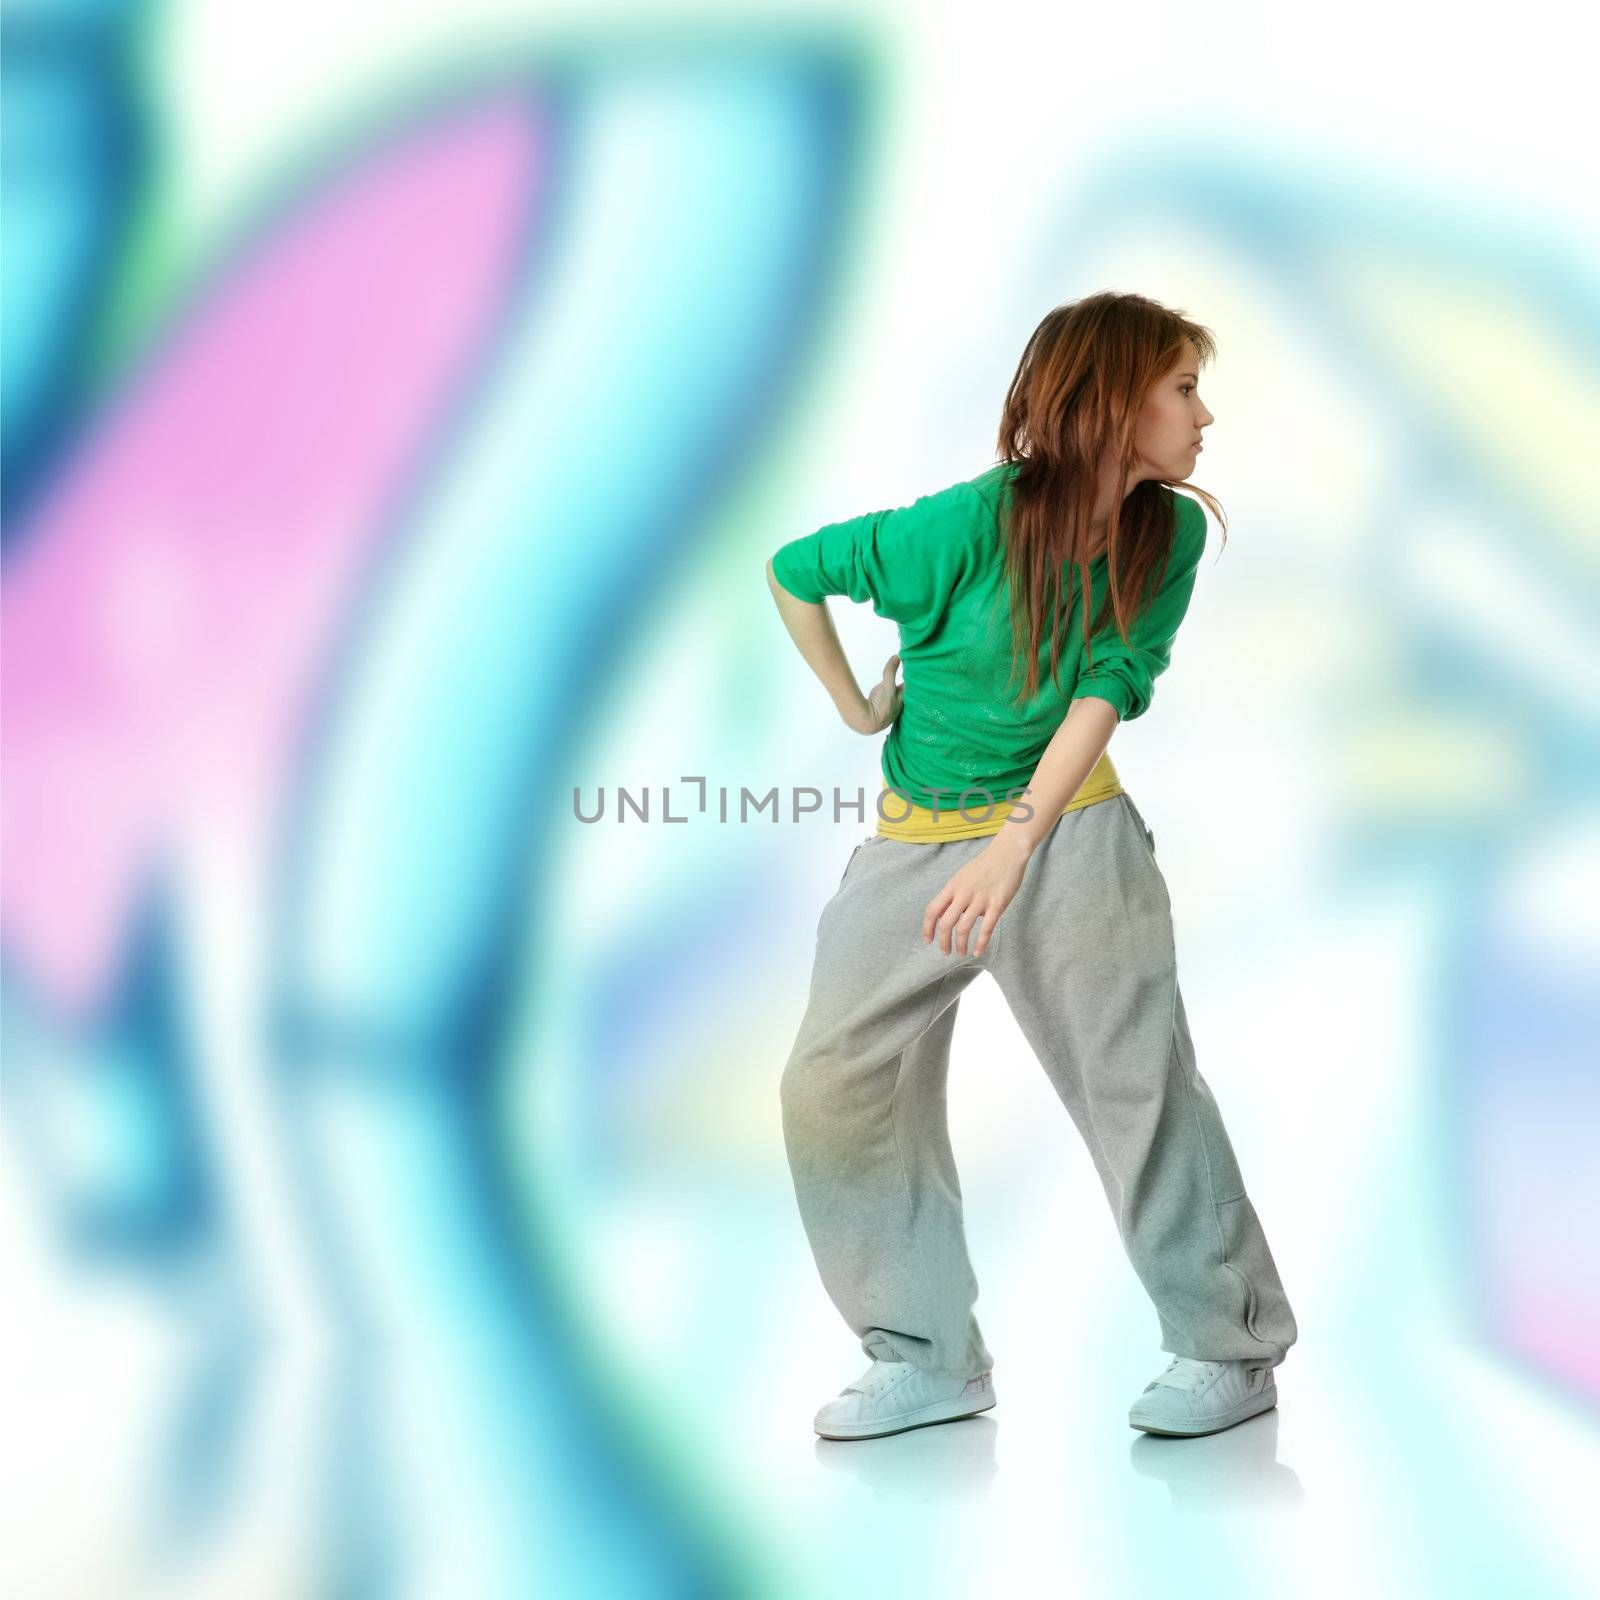 Modern dancer,  against abstract grafitti background